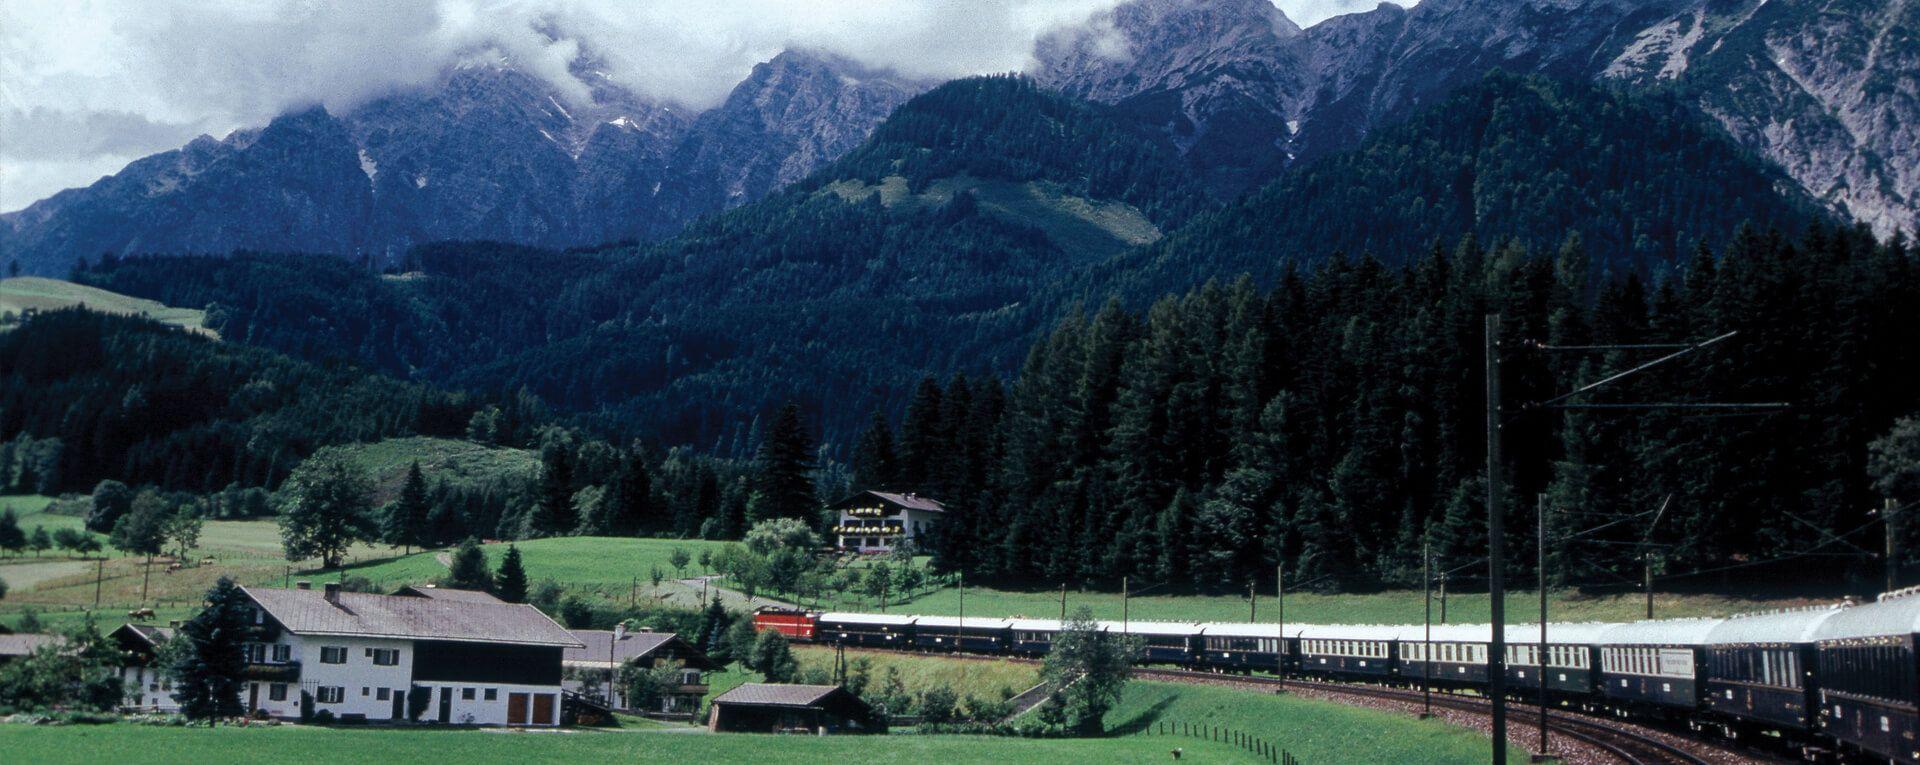 Venice Simplon-Orient Express